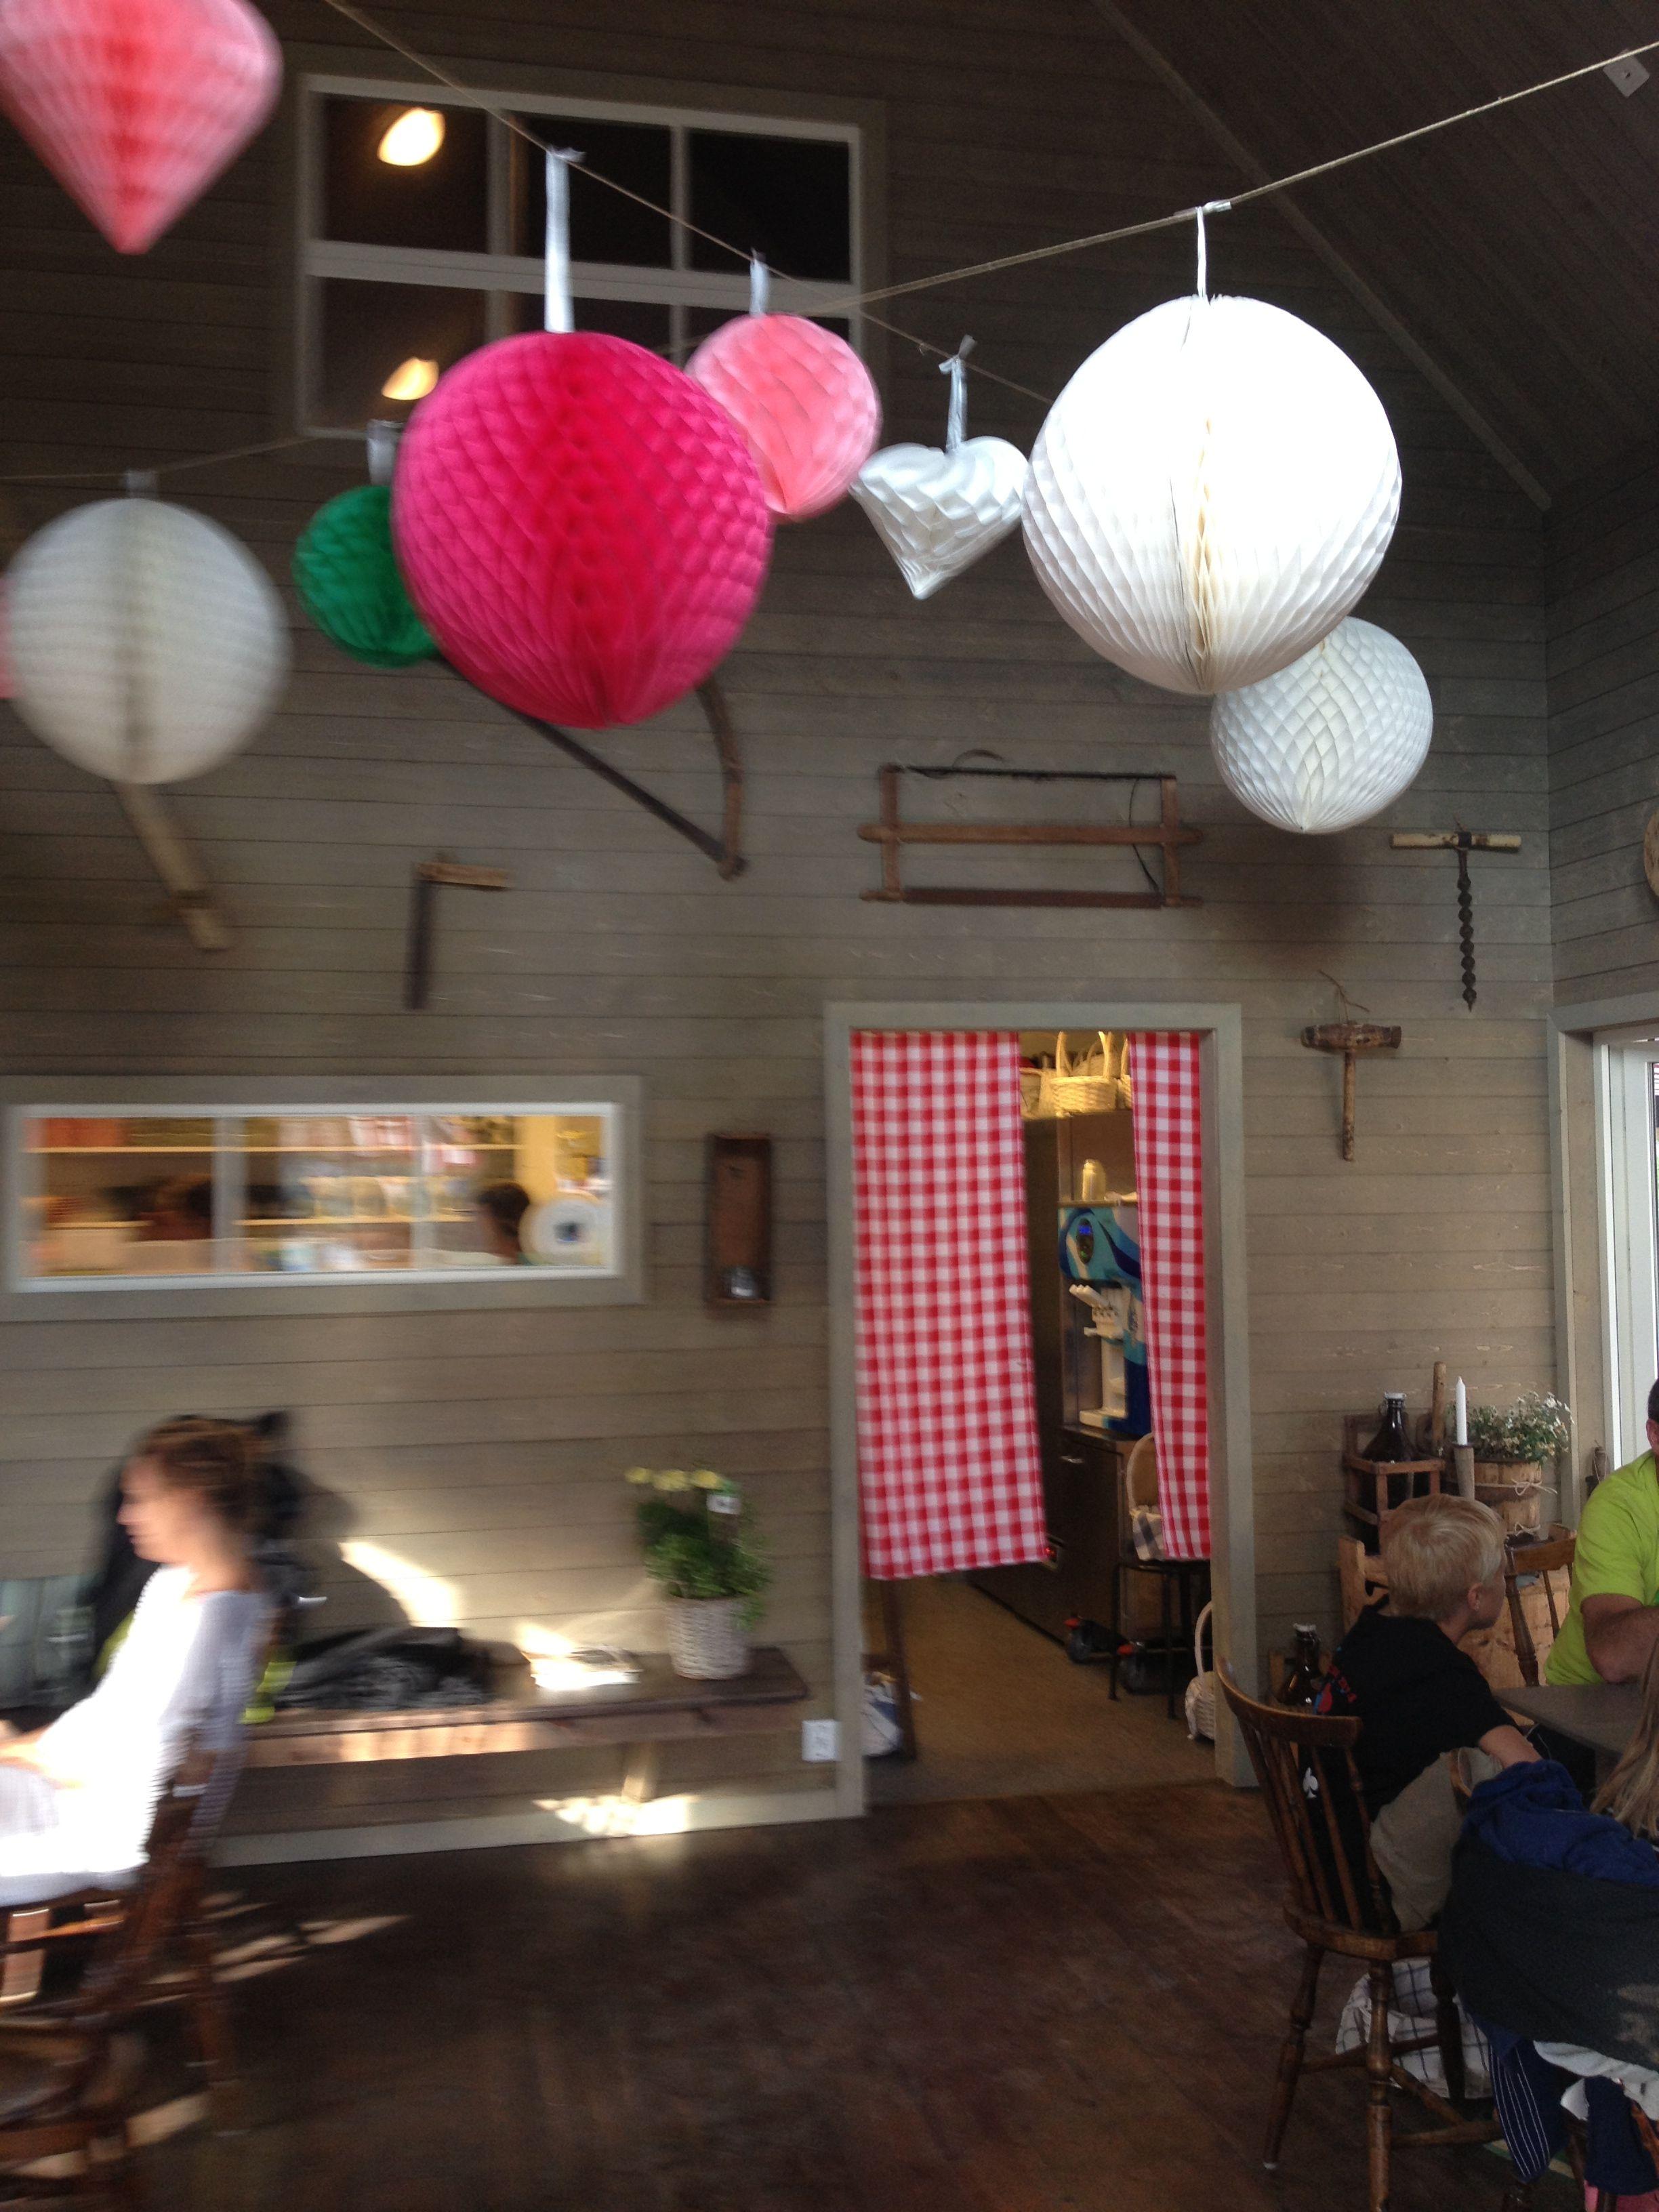 """Bondens glasskalas"" at Väddö, Sweden (Icecream café )"